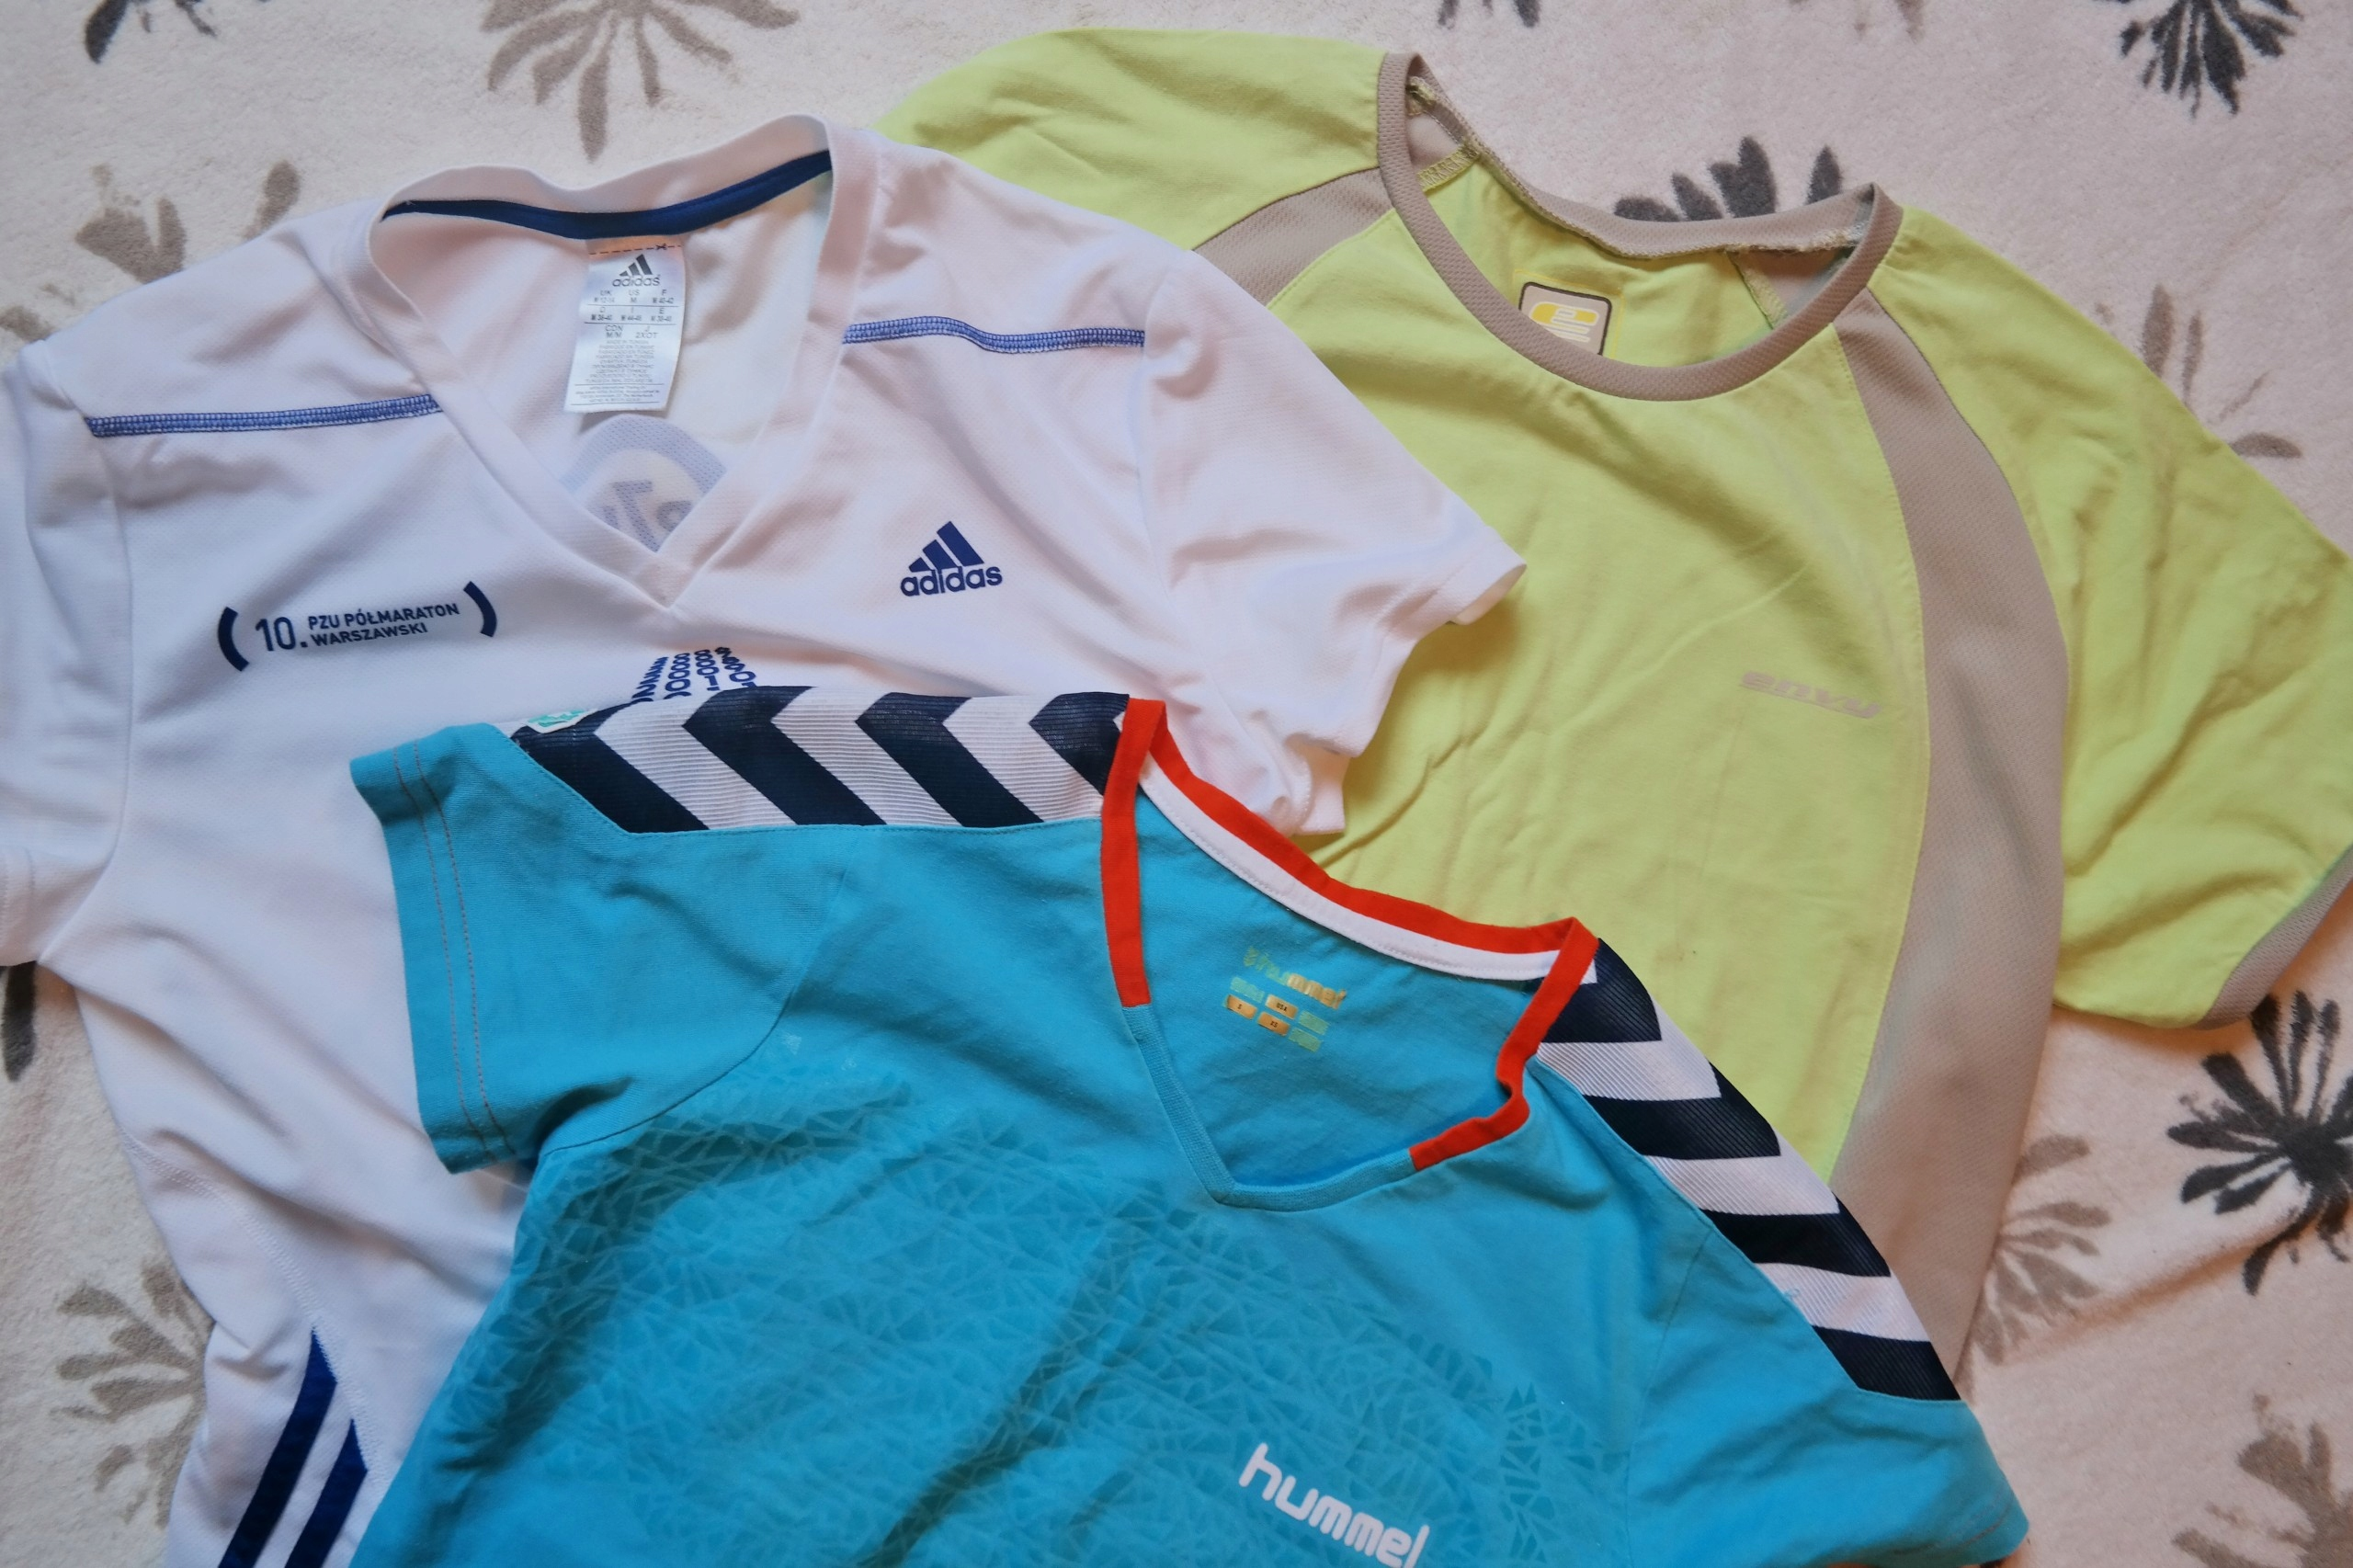 4887541f2 ADIDAS HUMMEL 3 koszulki damskie sportowe r. 38 M - 7433950900 ...